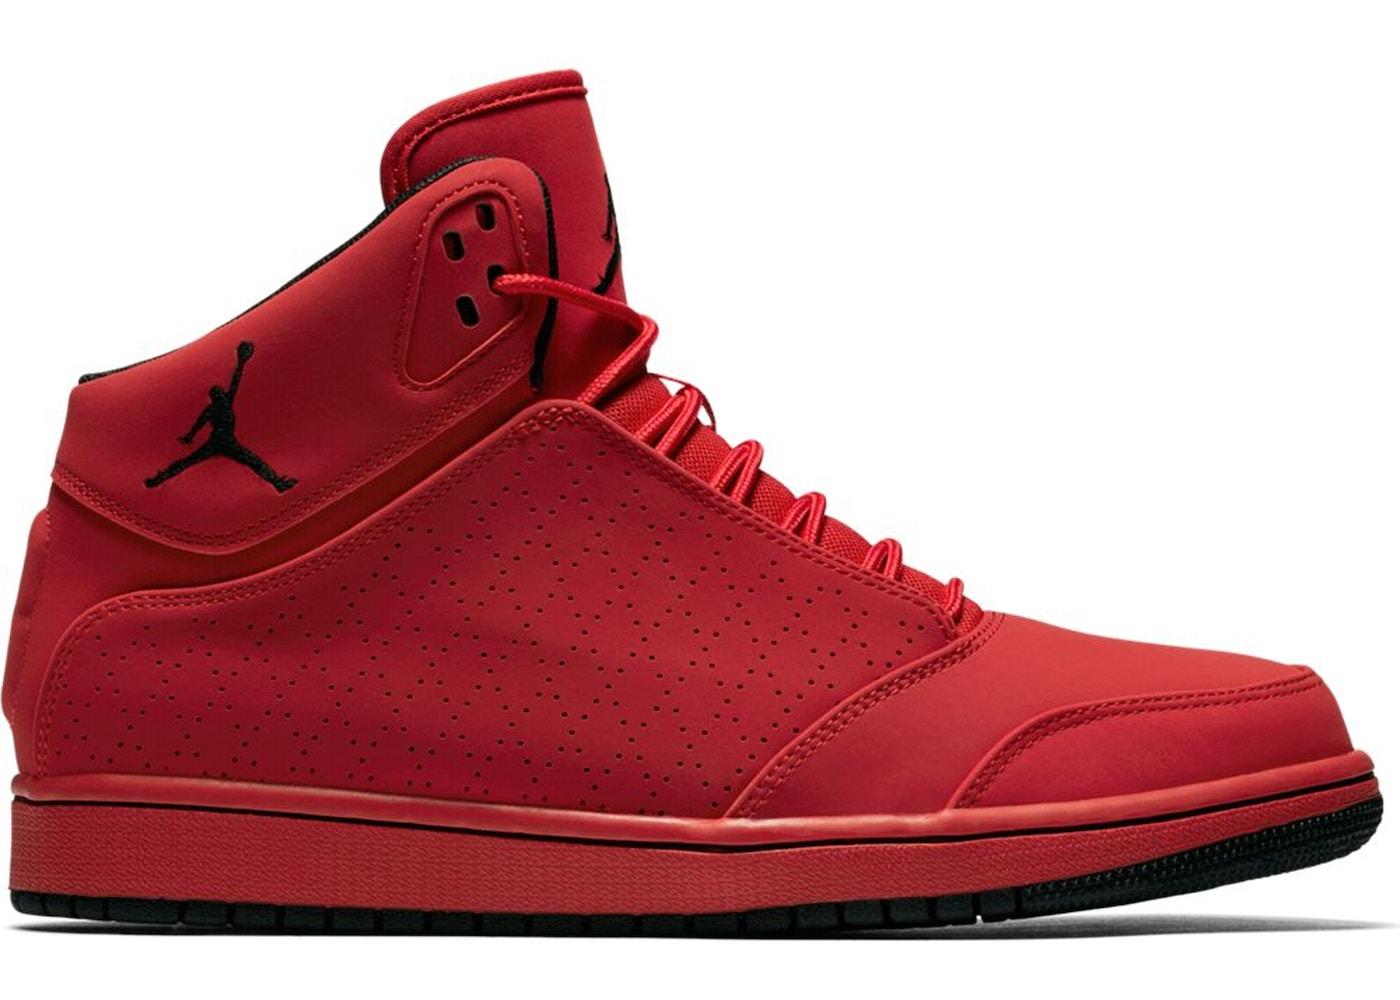 4bdeefab758 Sell. or Ask. Size: 11.5. View All Bids. Jordan 1 Flight 5 Gym Red Black